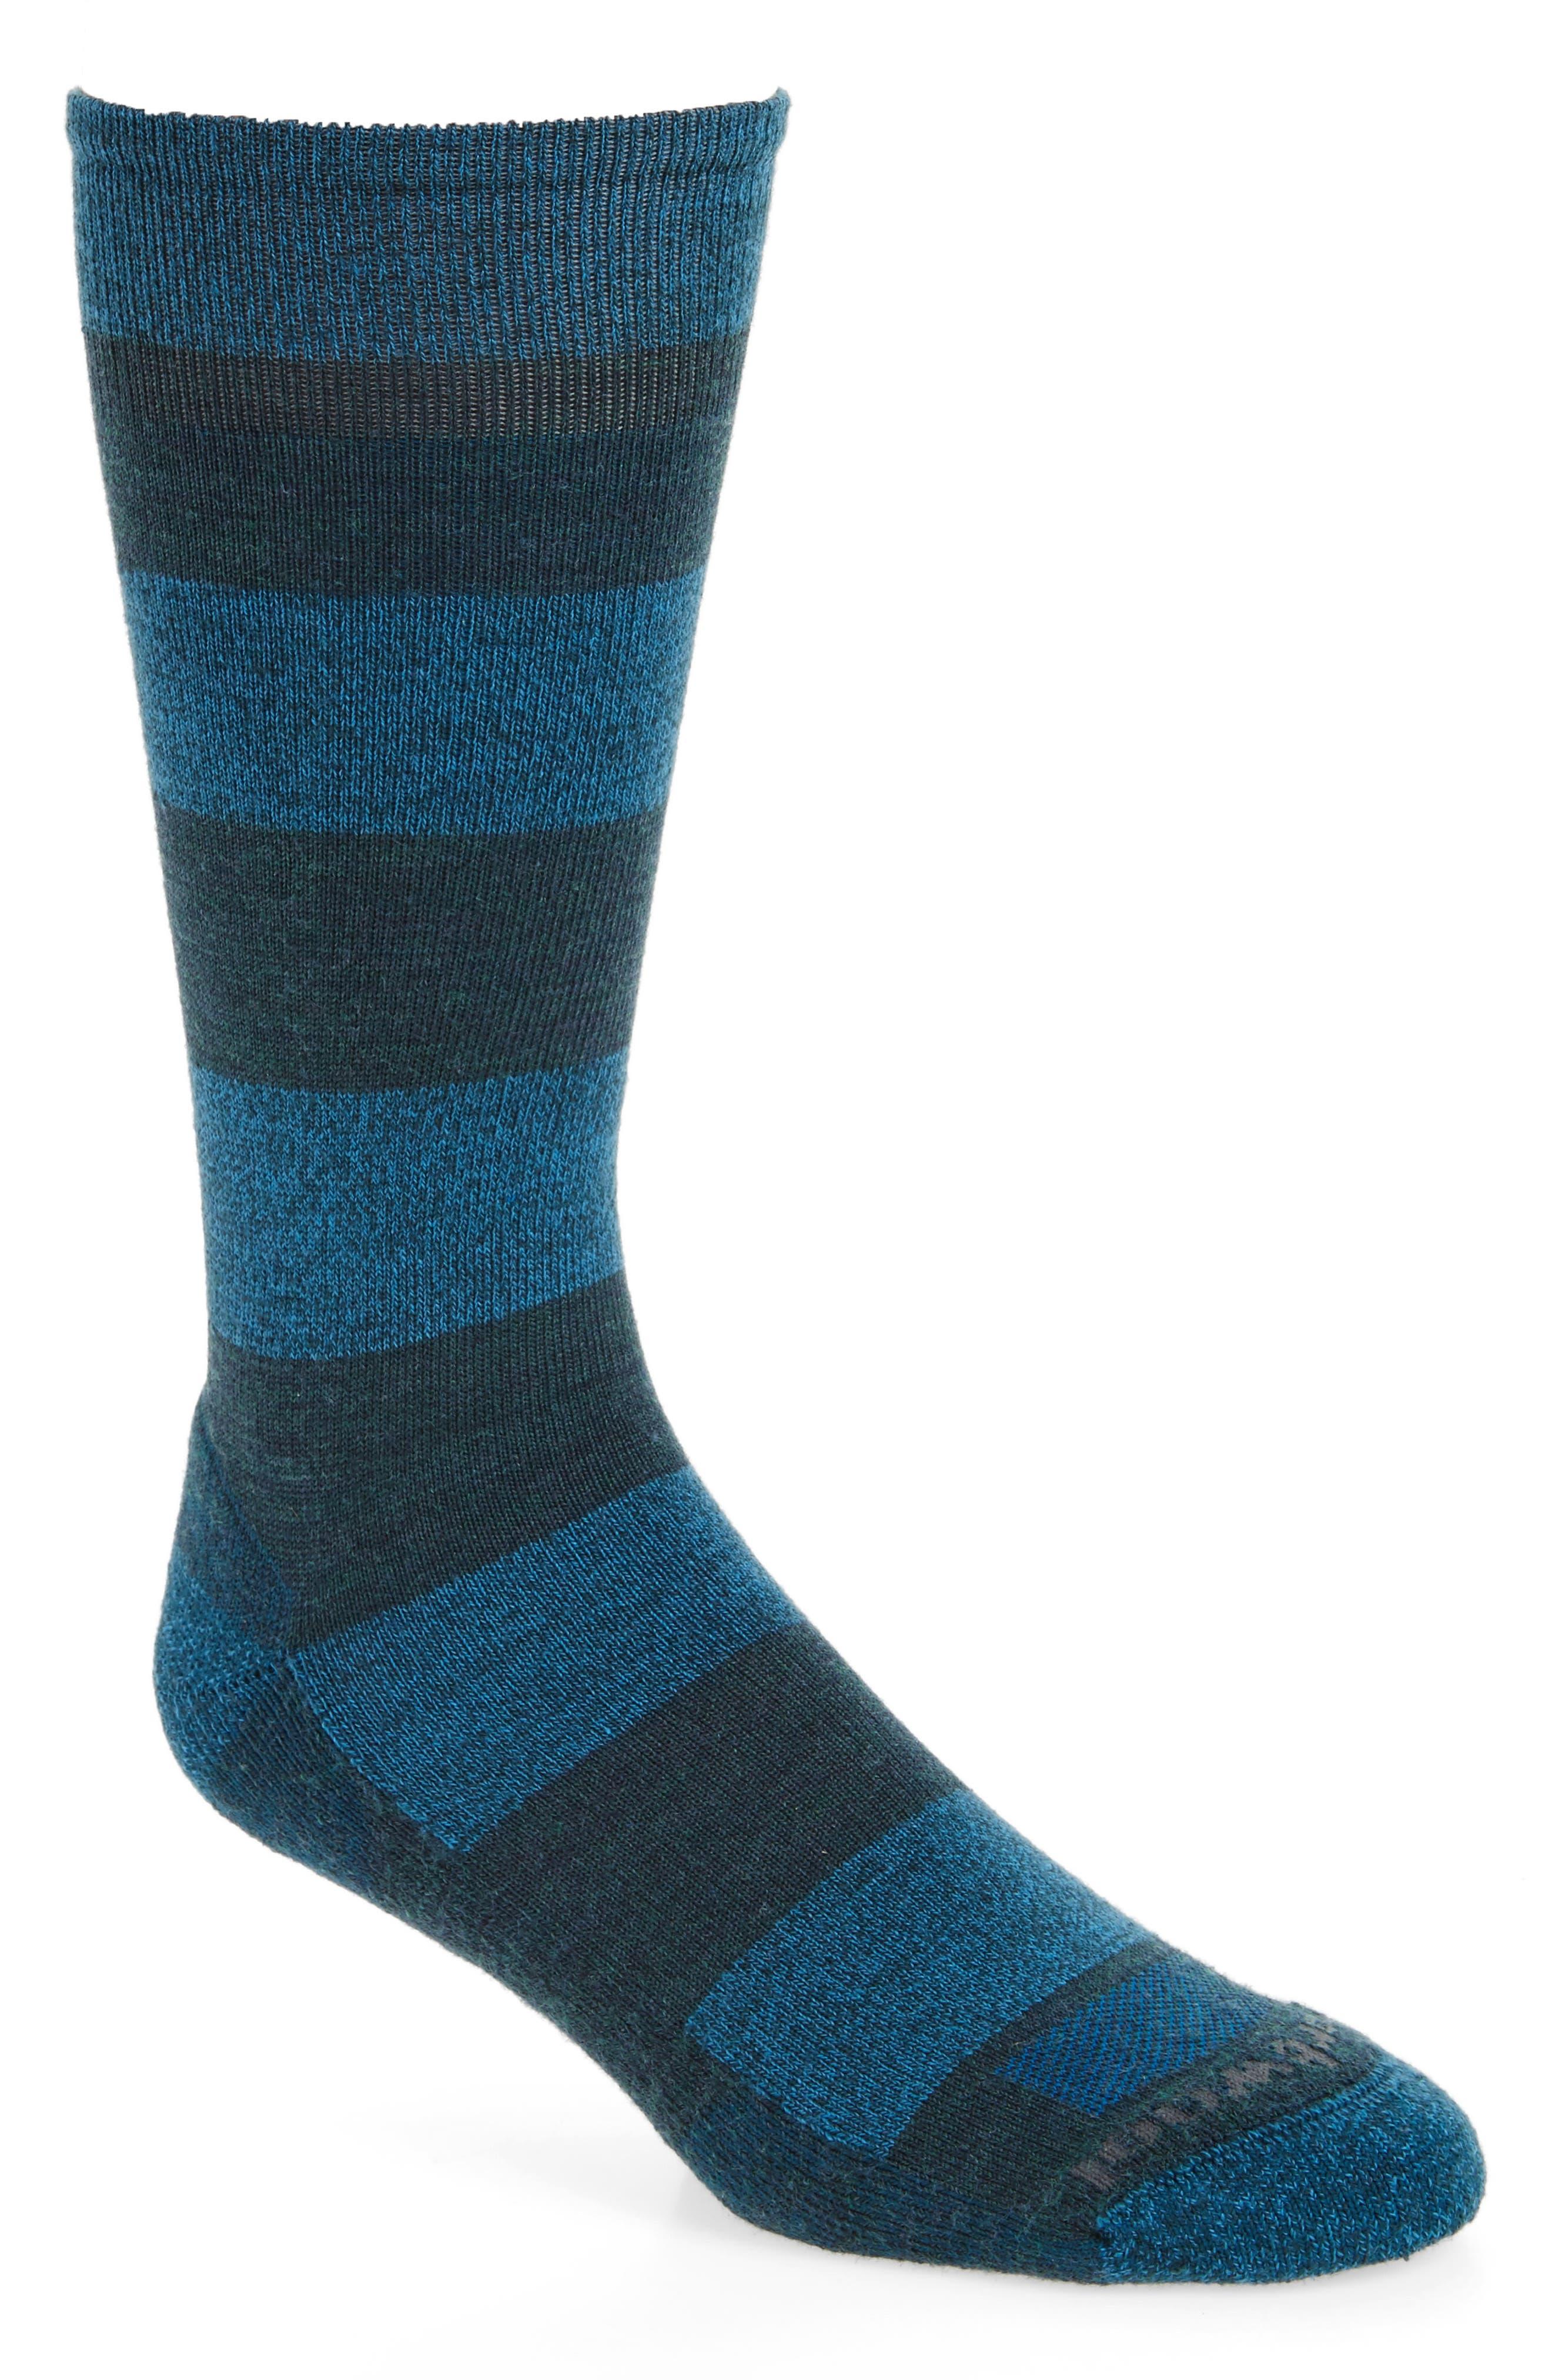 Gimsby Stripe Socks,                         Main,                         color, Lochness Heather